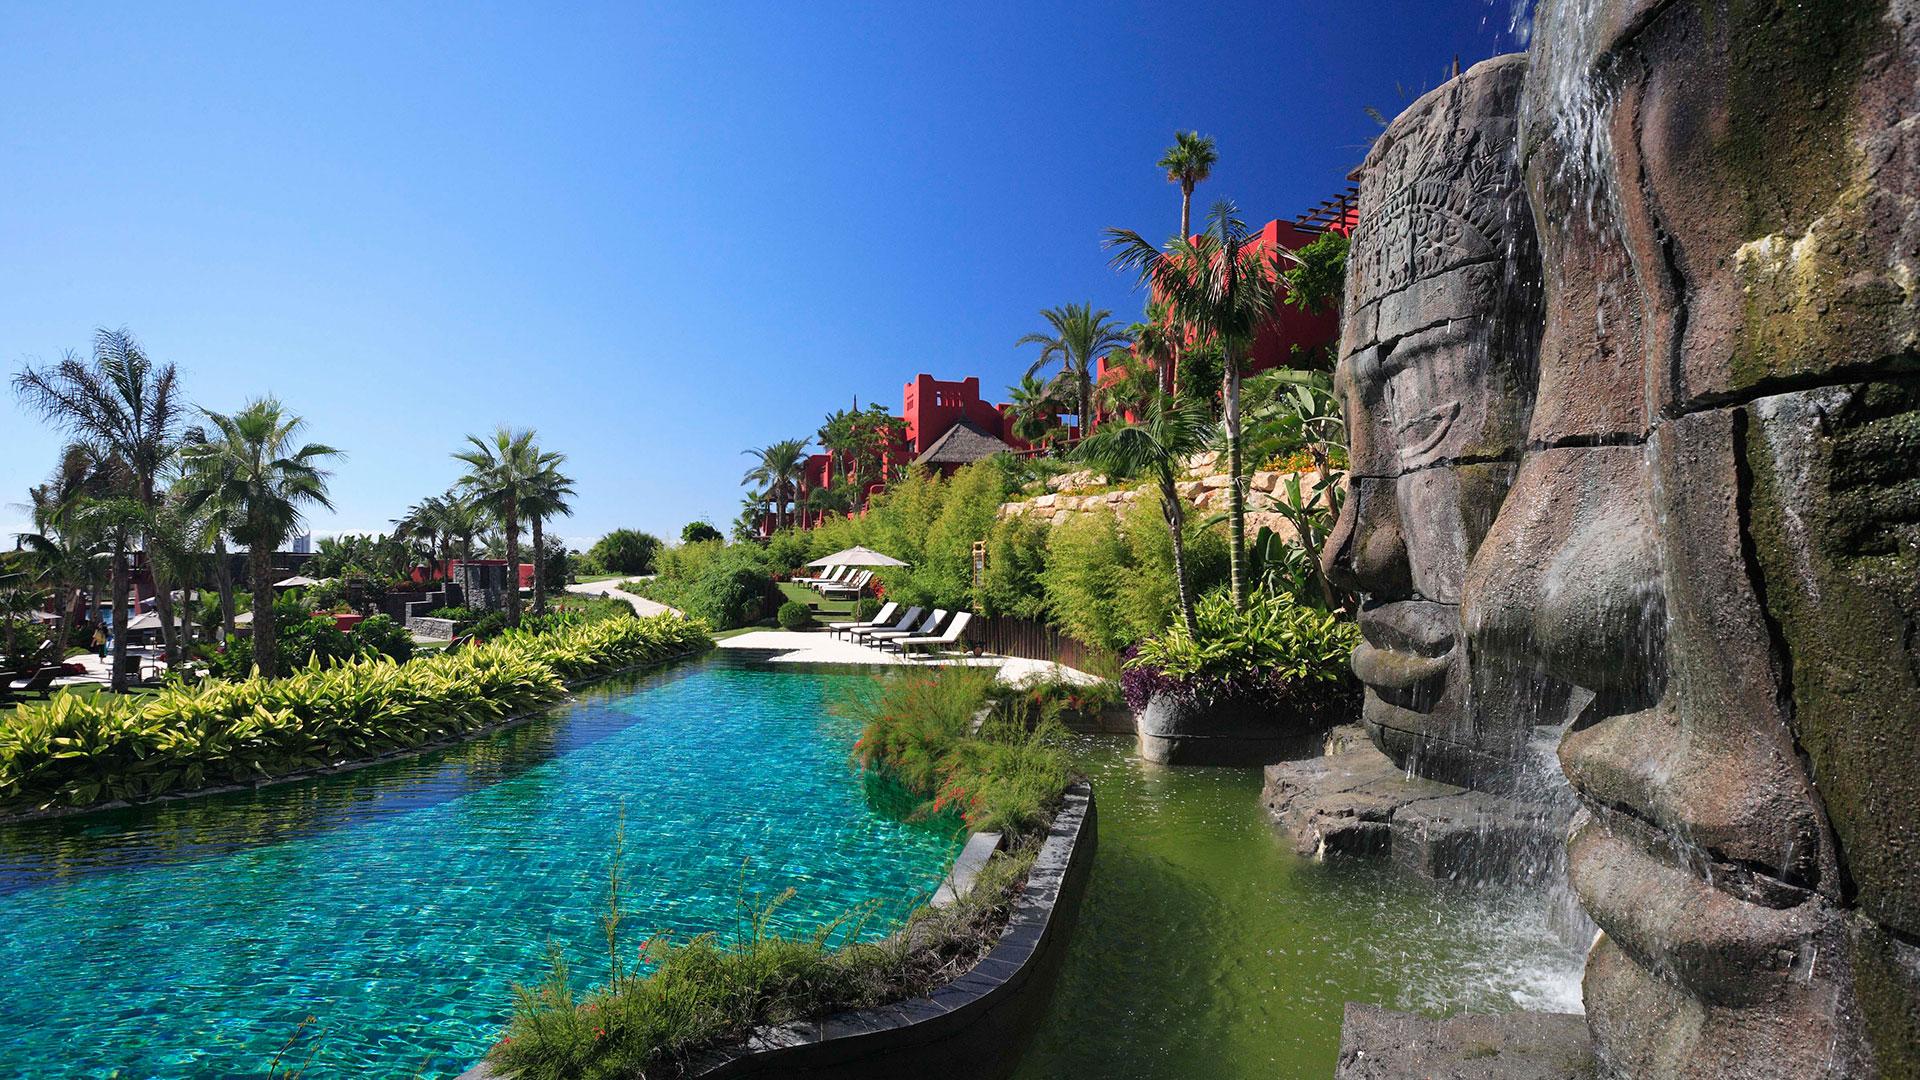 Asia Gardens hero asset